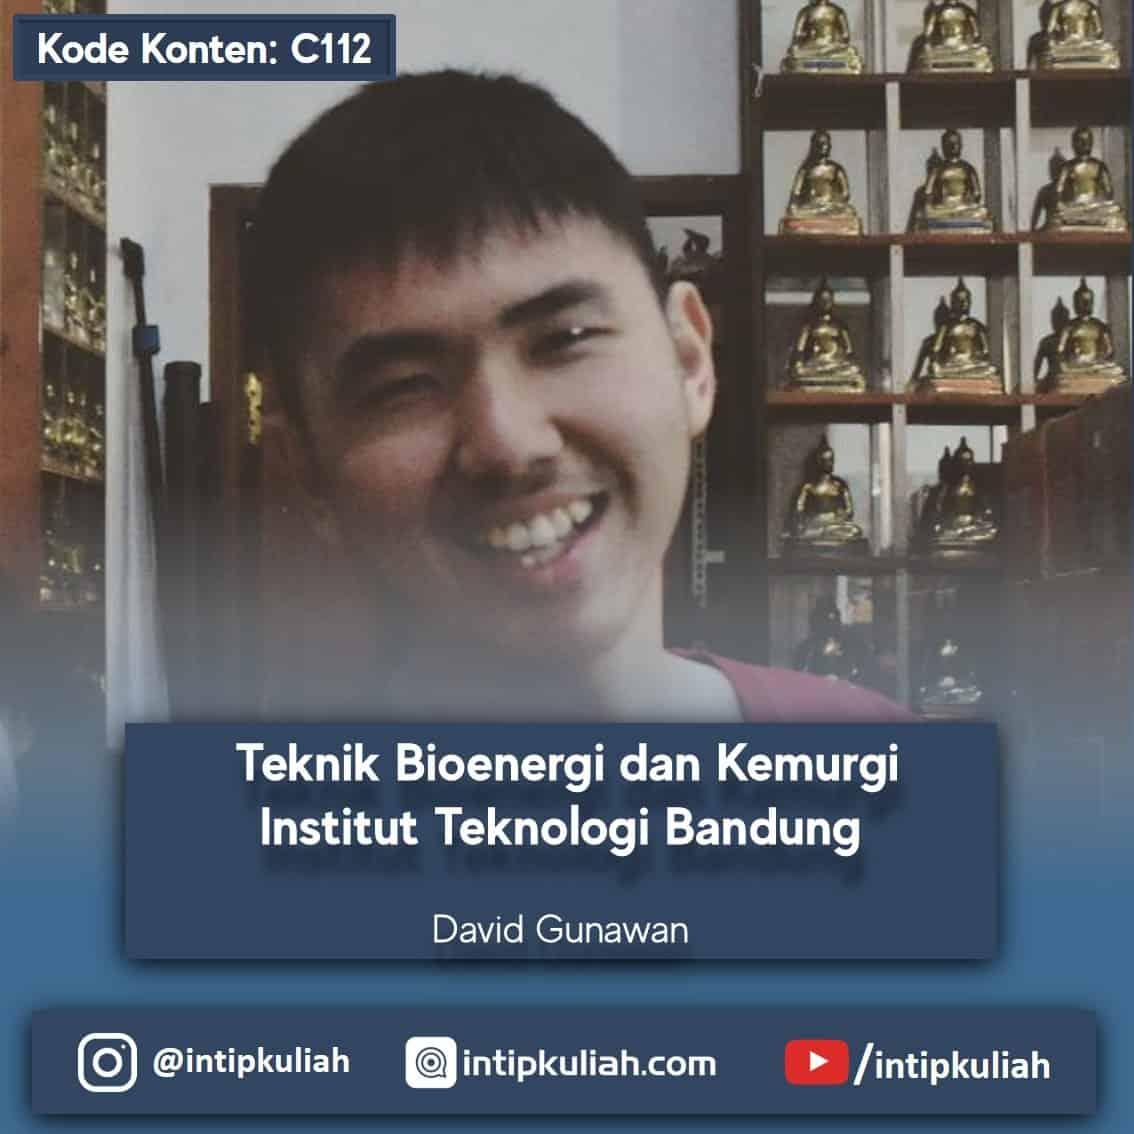 Teknik Bioenergi dan Kemurgi ITB (David)